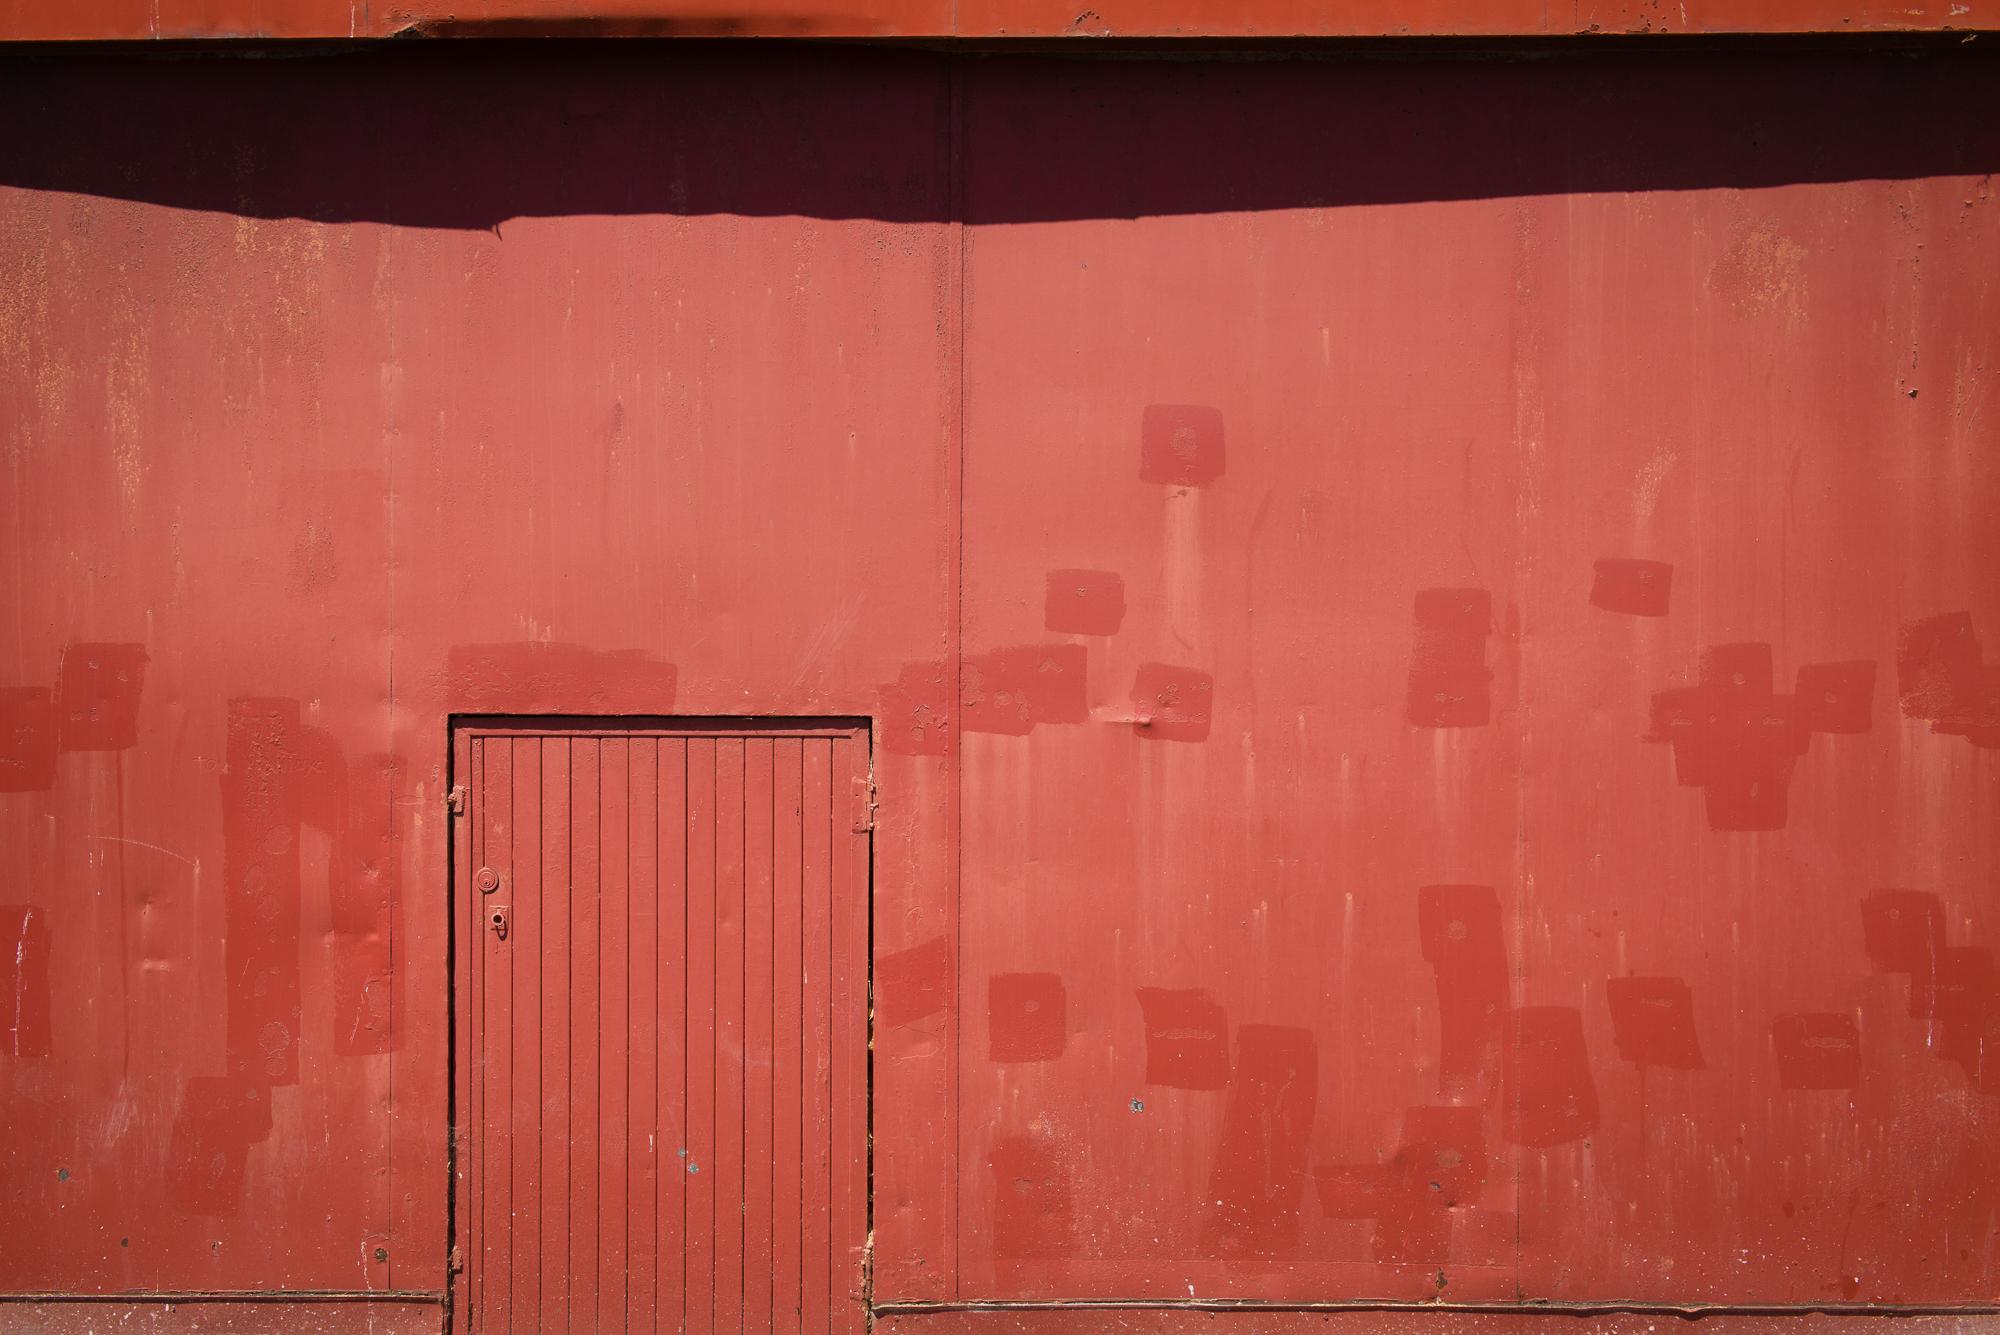 Pier 3 Warehouse Wall  - 2013 San Francisco, CA